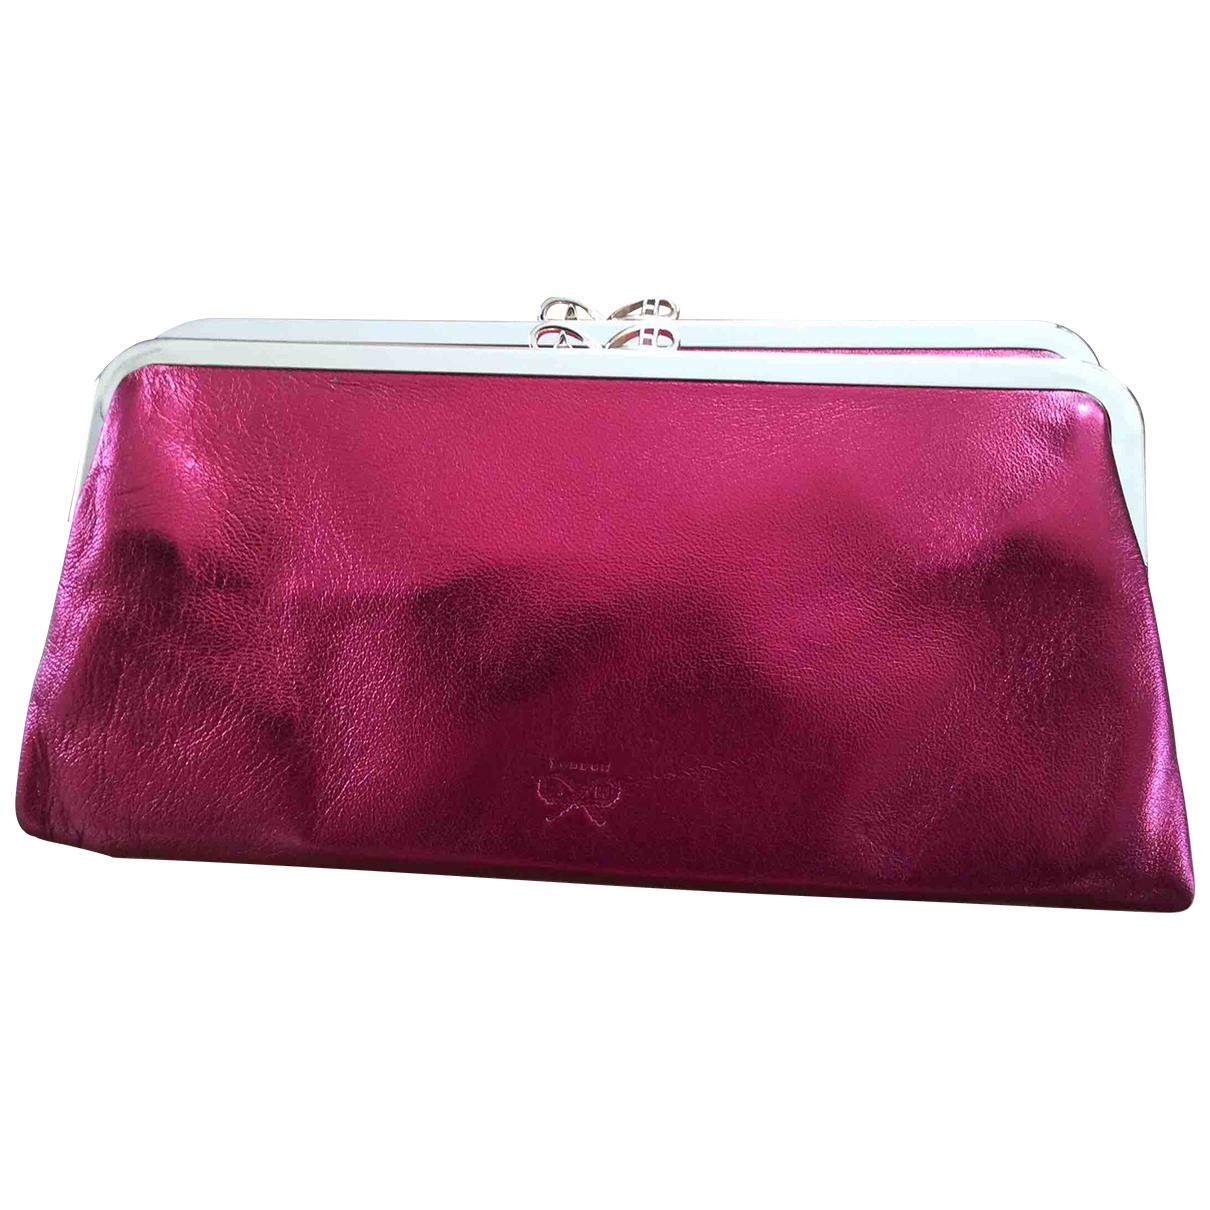 Anya Hindmarch N Burgundy Leather Clutch bag for Women N